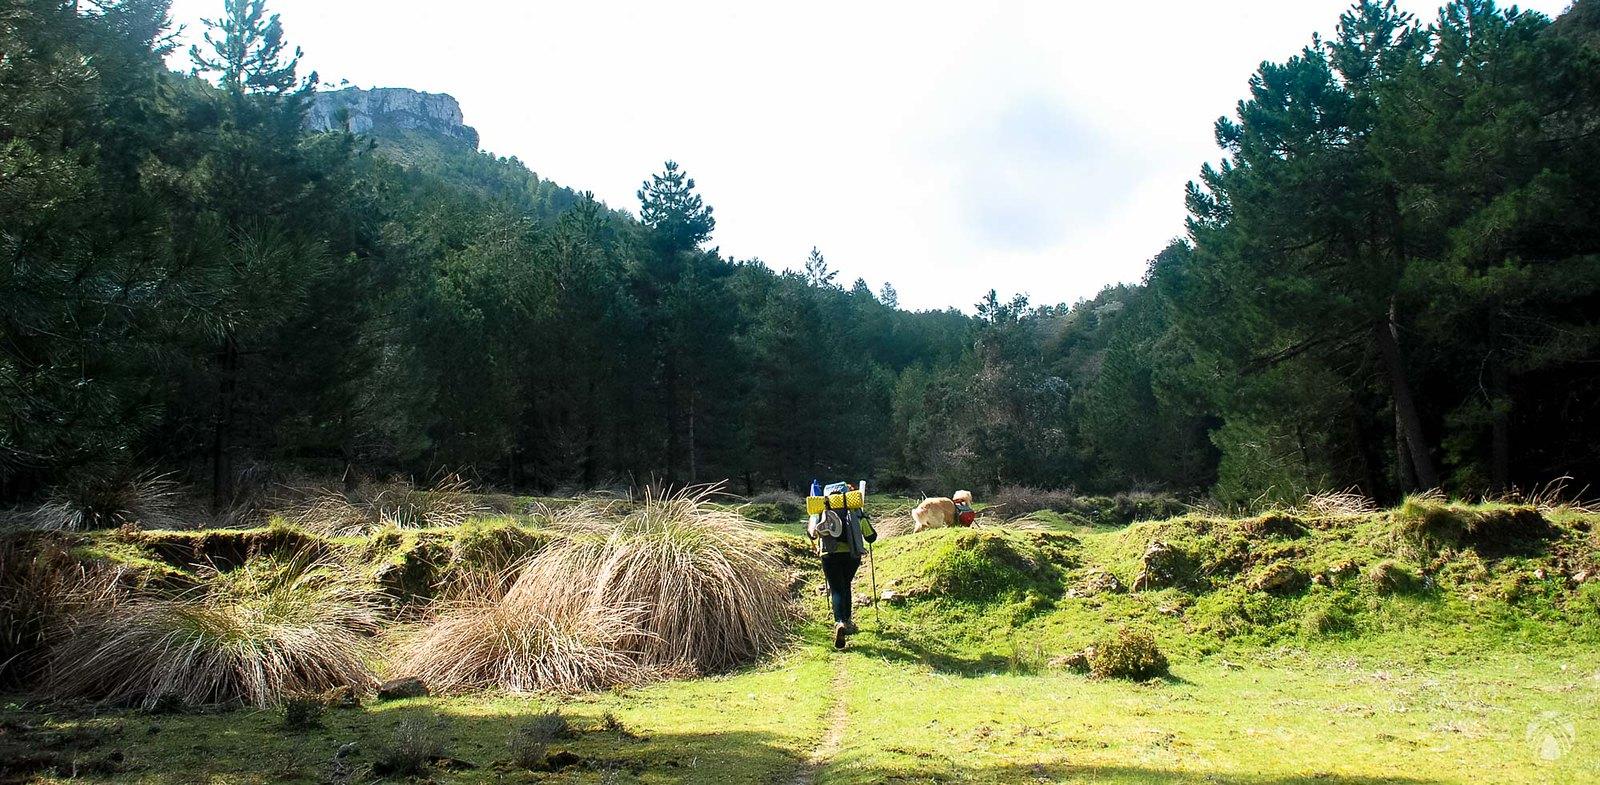 Cañada del Avellano